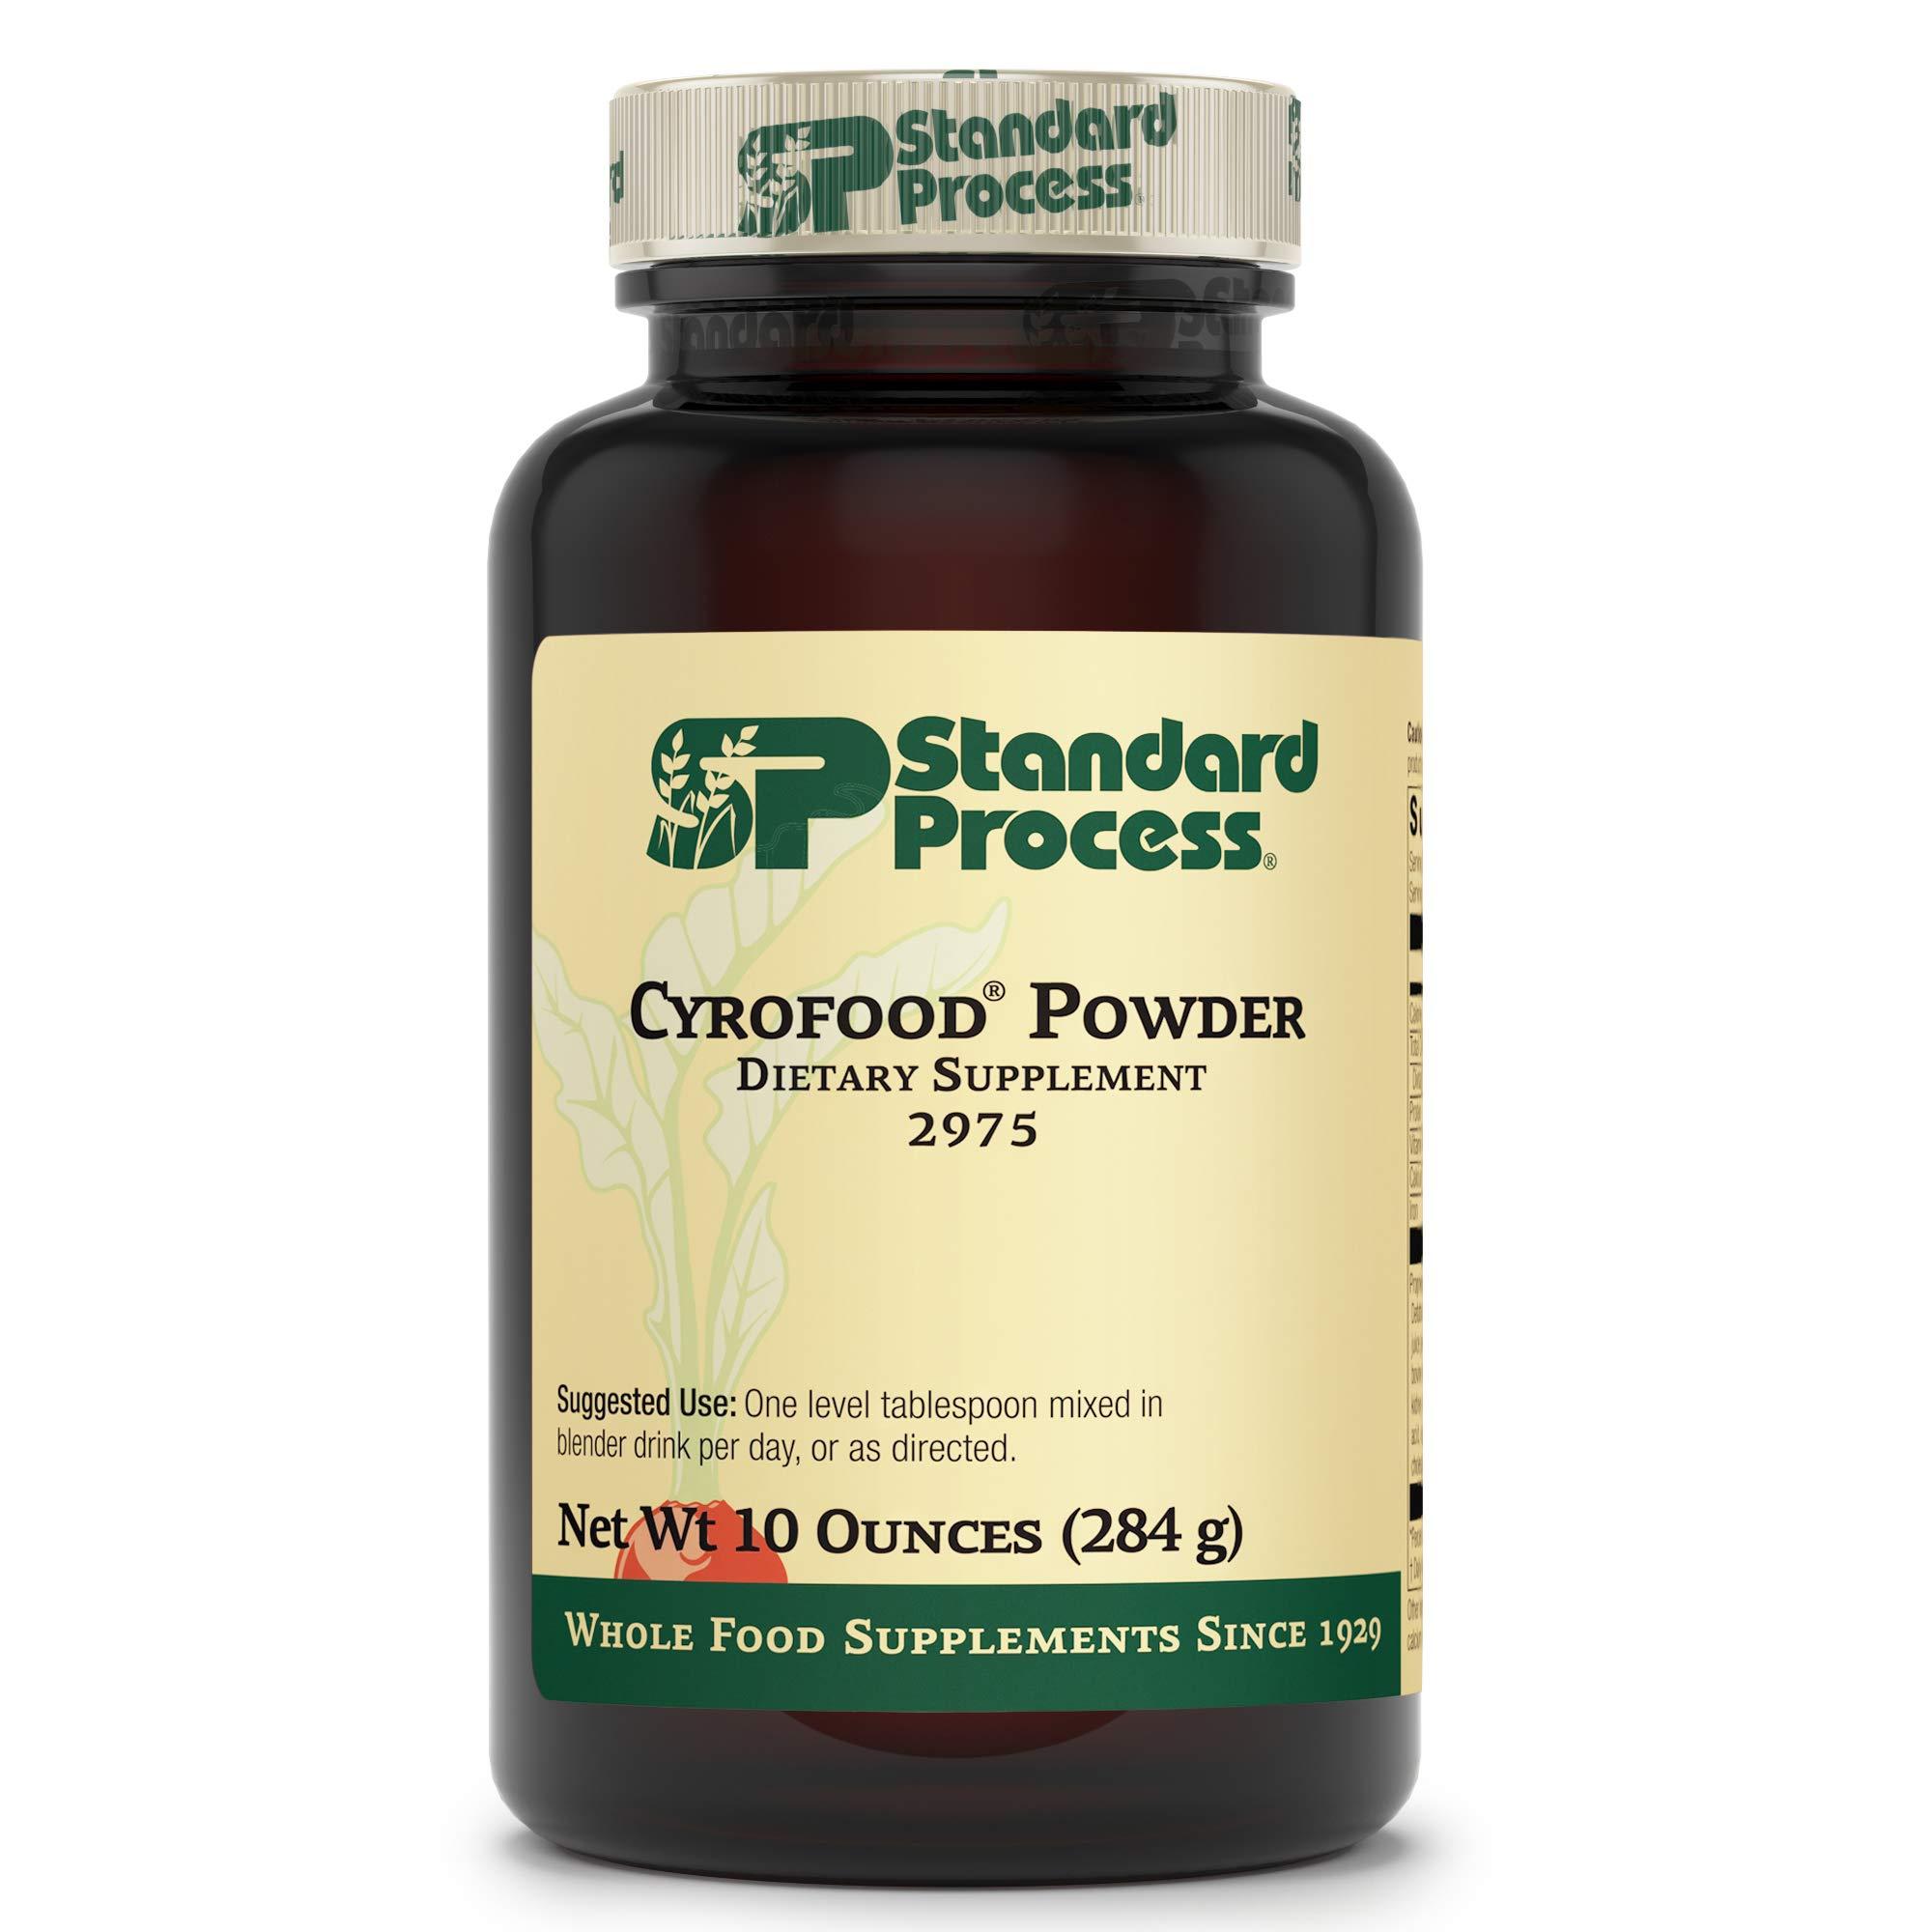 Standard Process - Cyrofood Powder - 10 Ounce